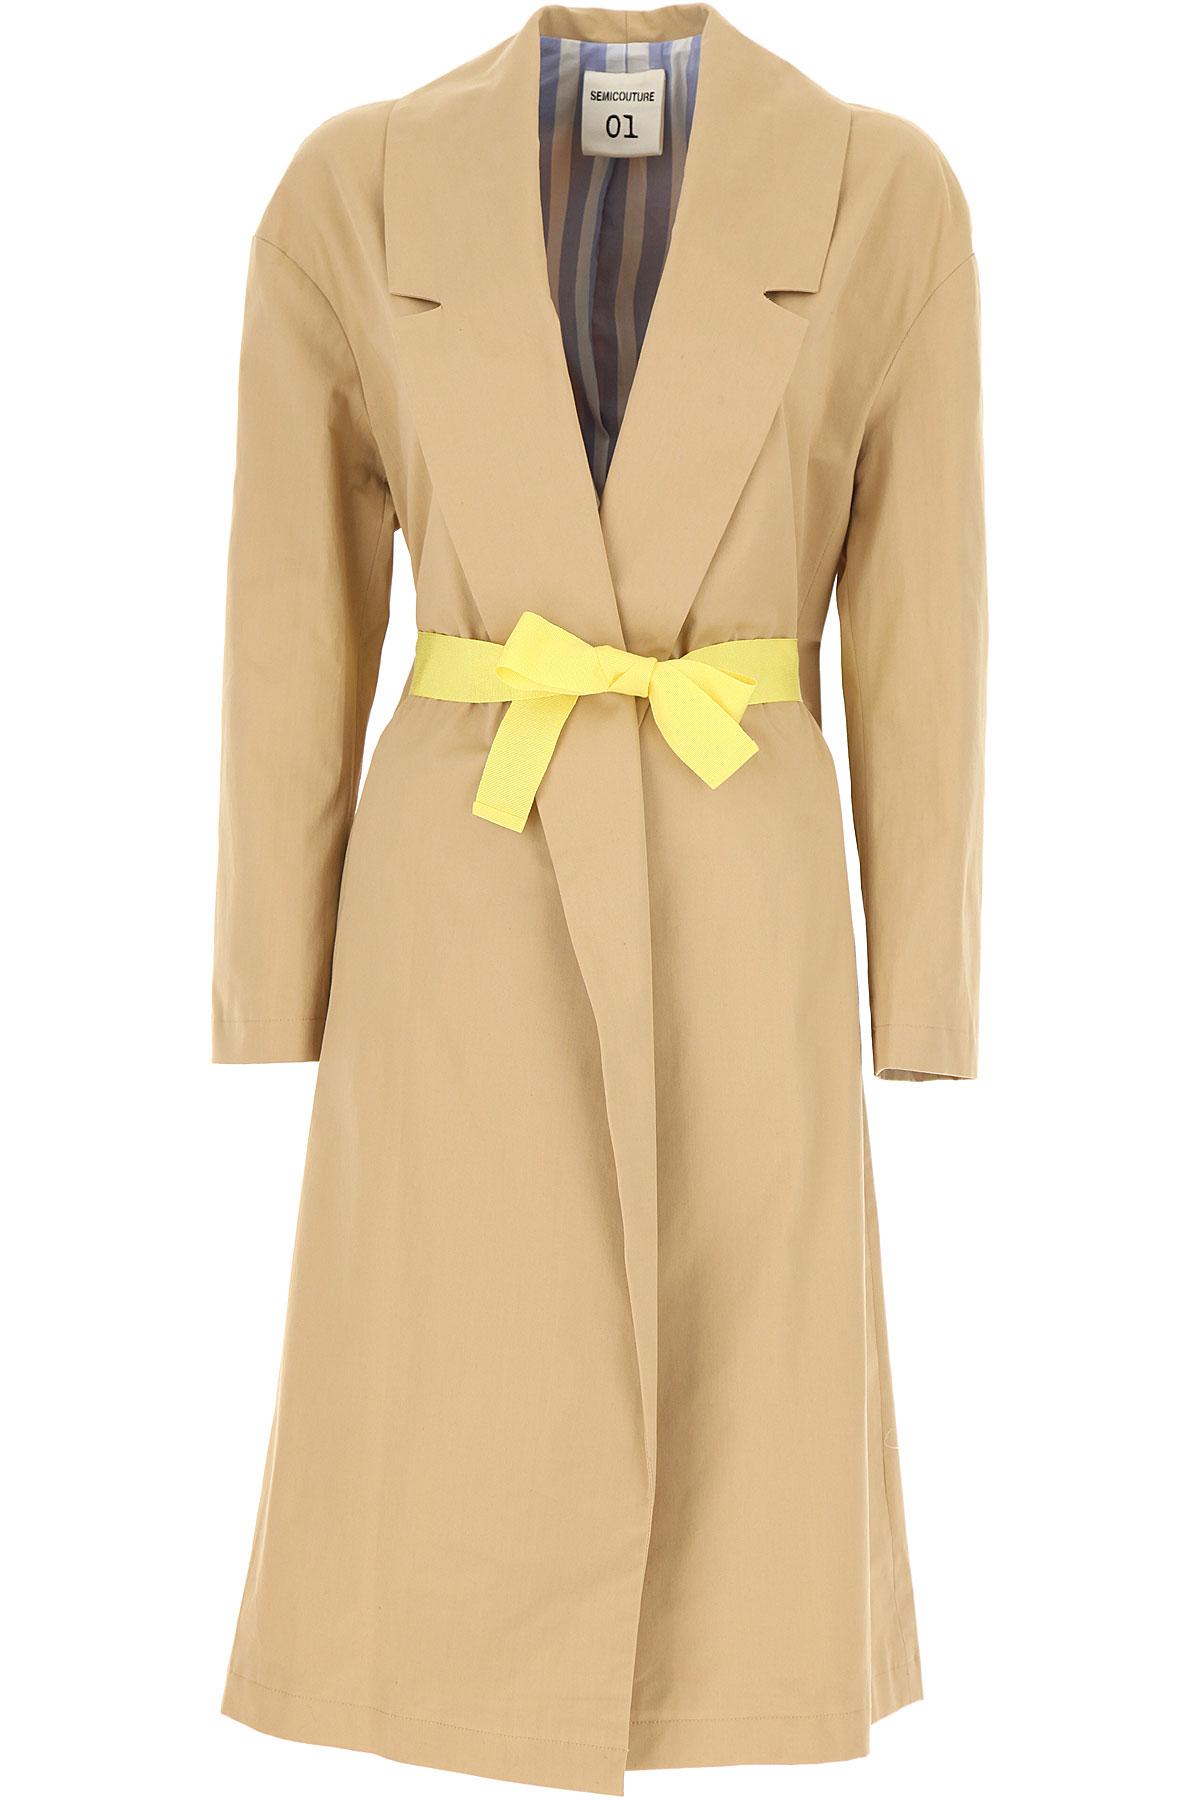 Semicouture Women's Coat On Sale, Beige, Cotton, 2019, 4 6